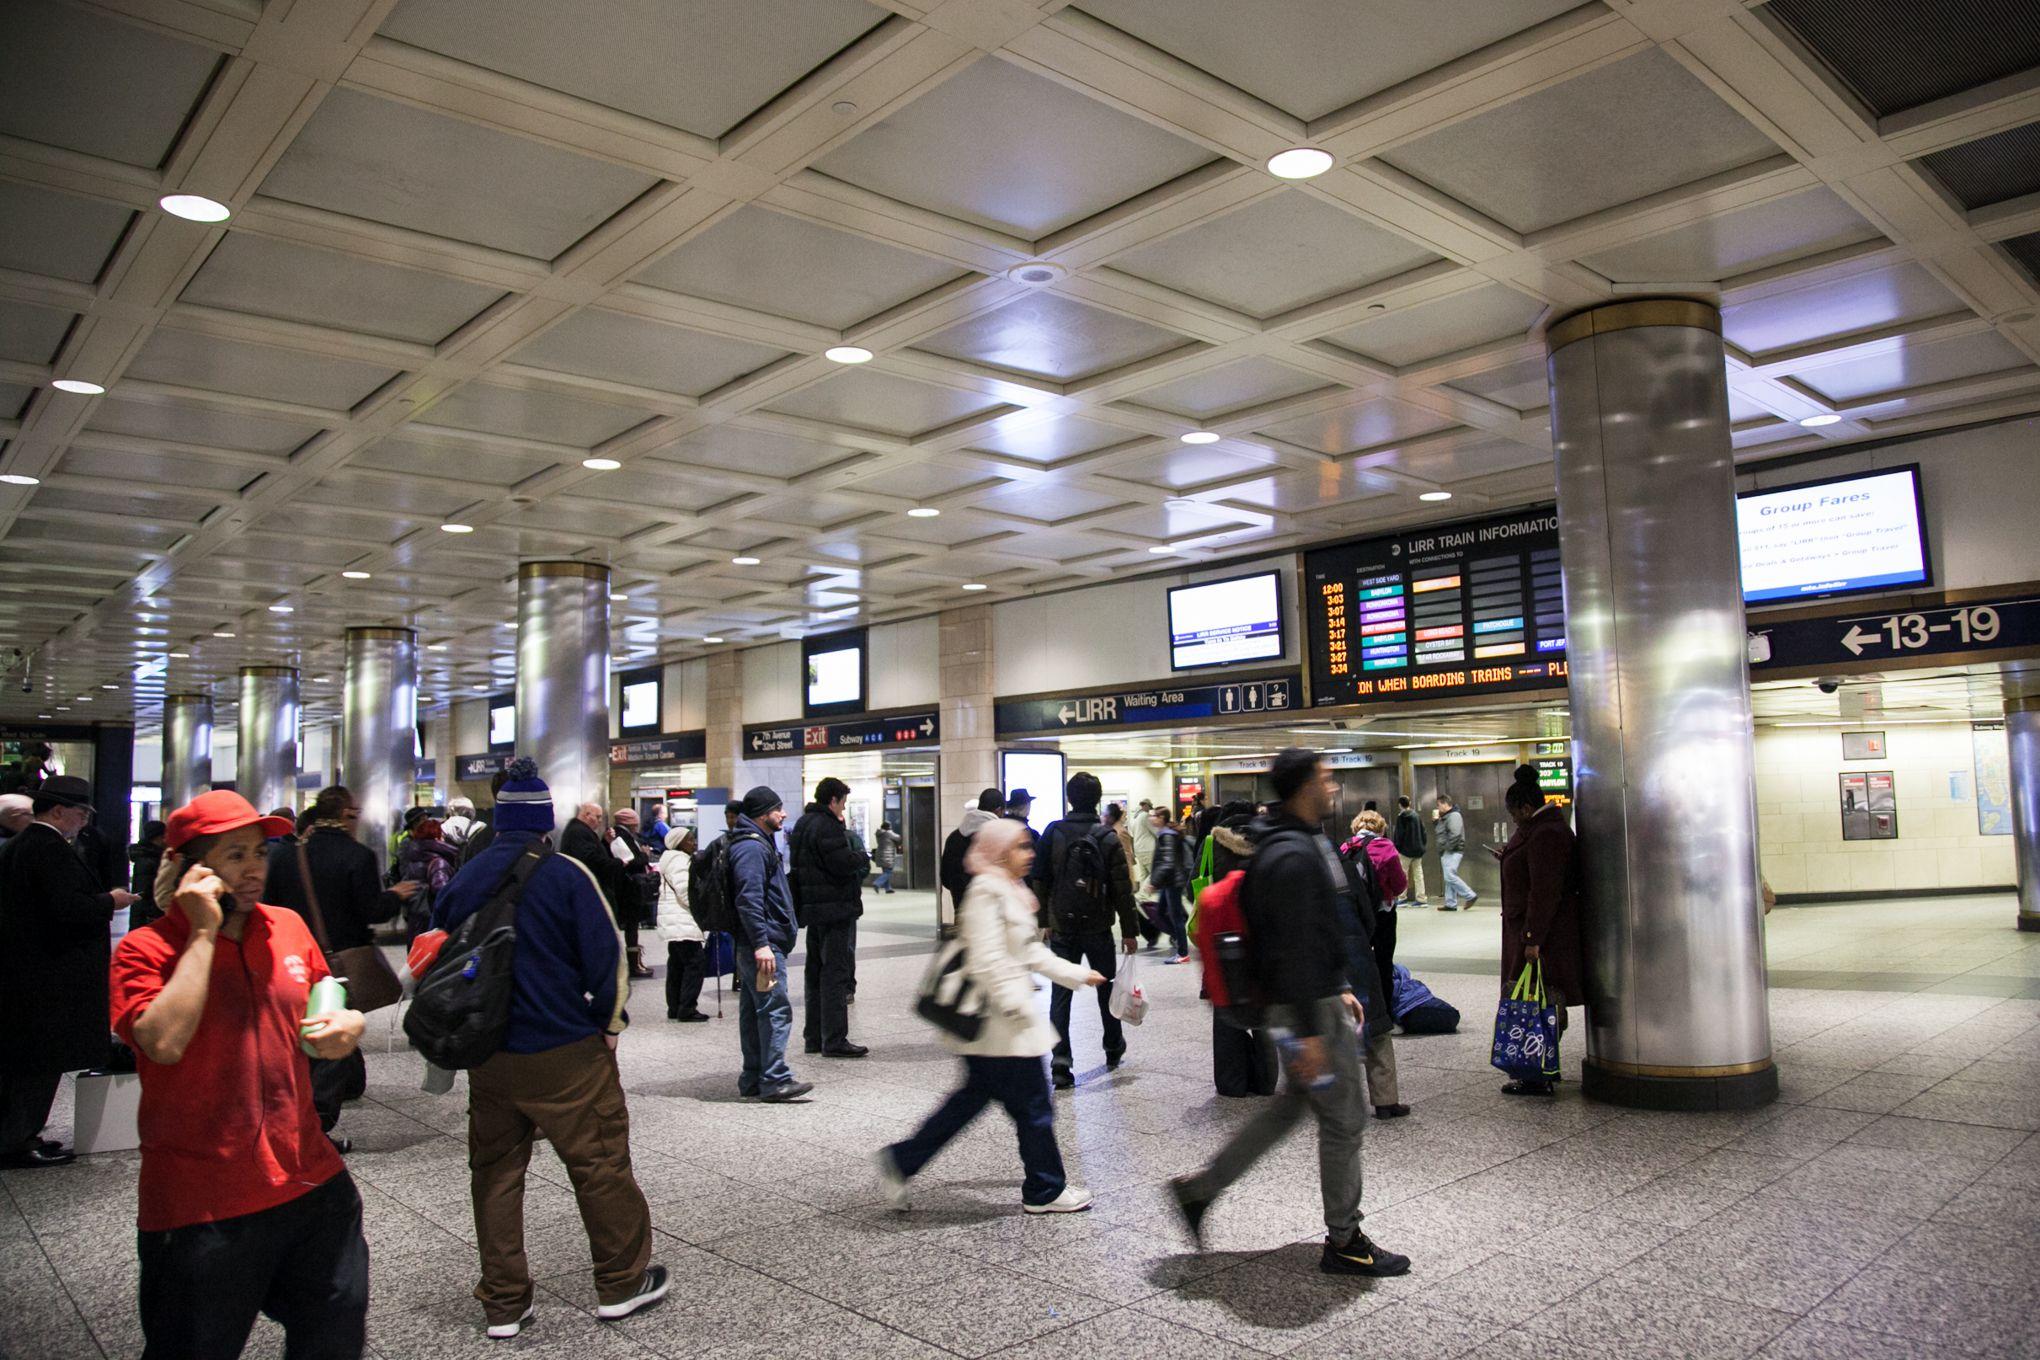 Inside America's worst train station | The Verge